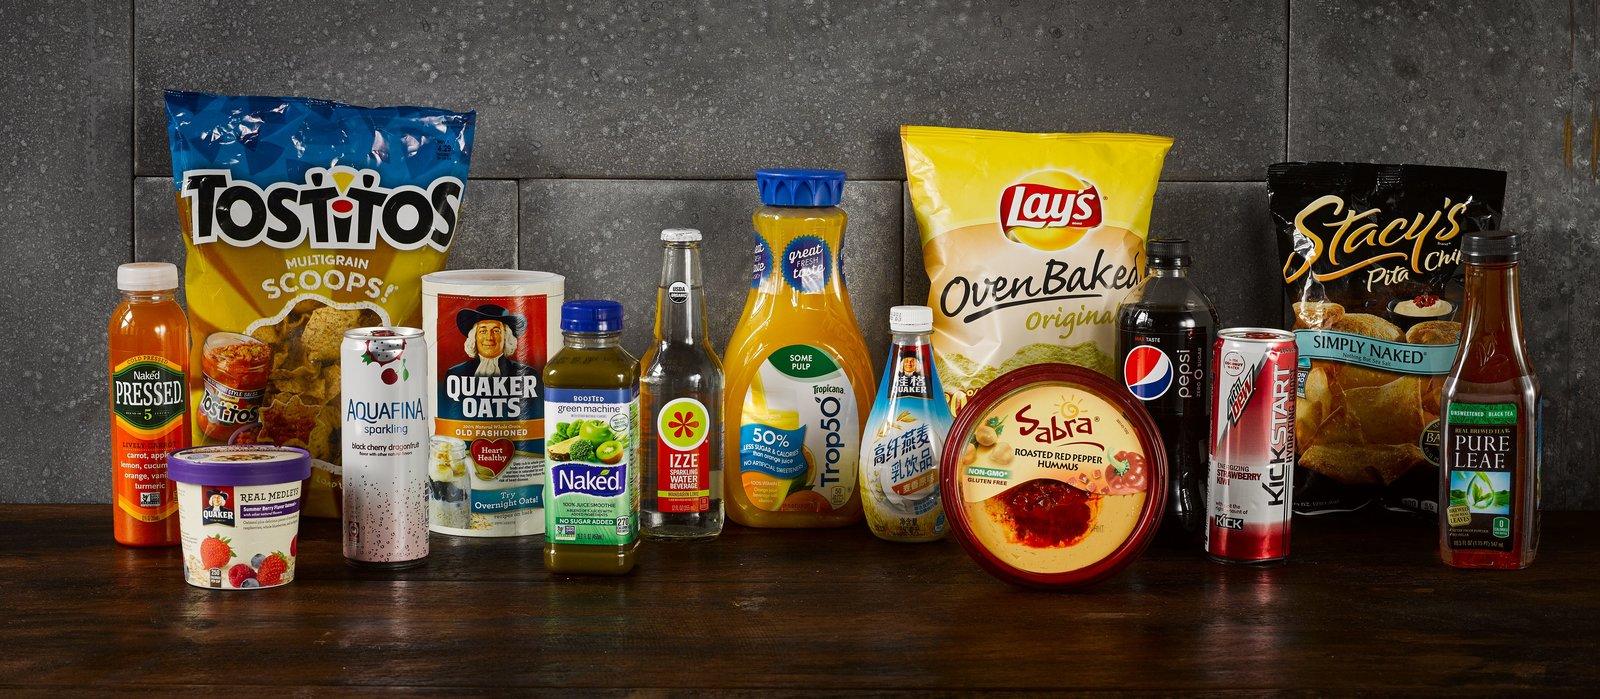 Pepsi food and beverage brands